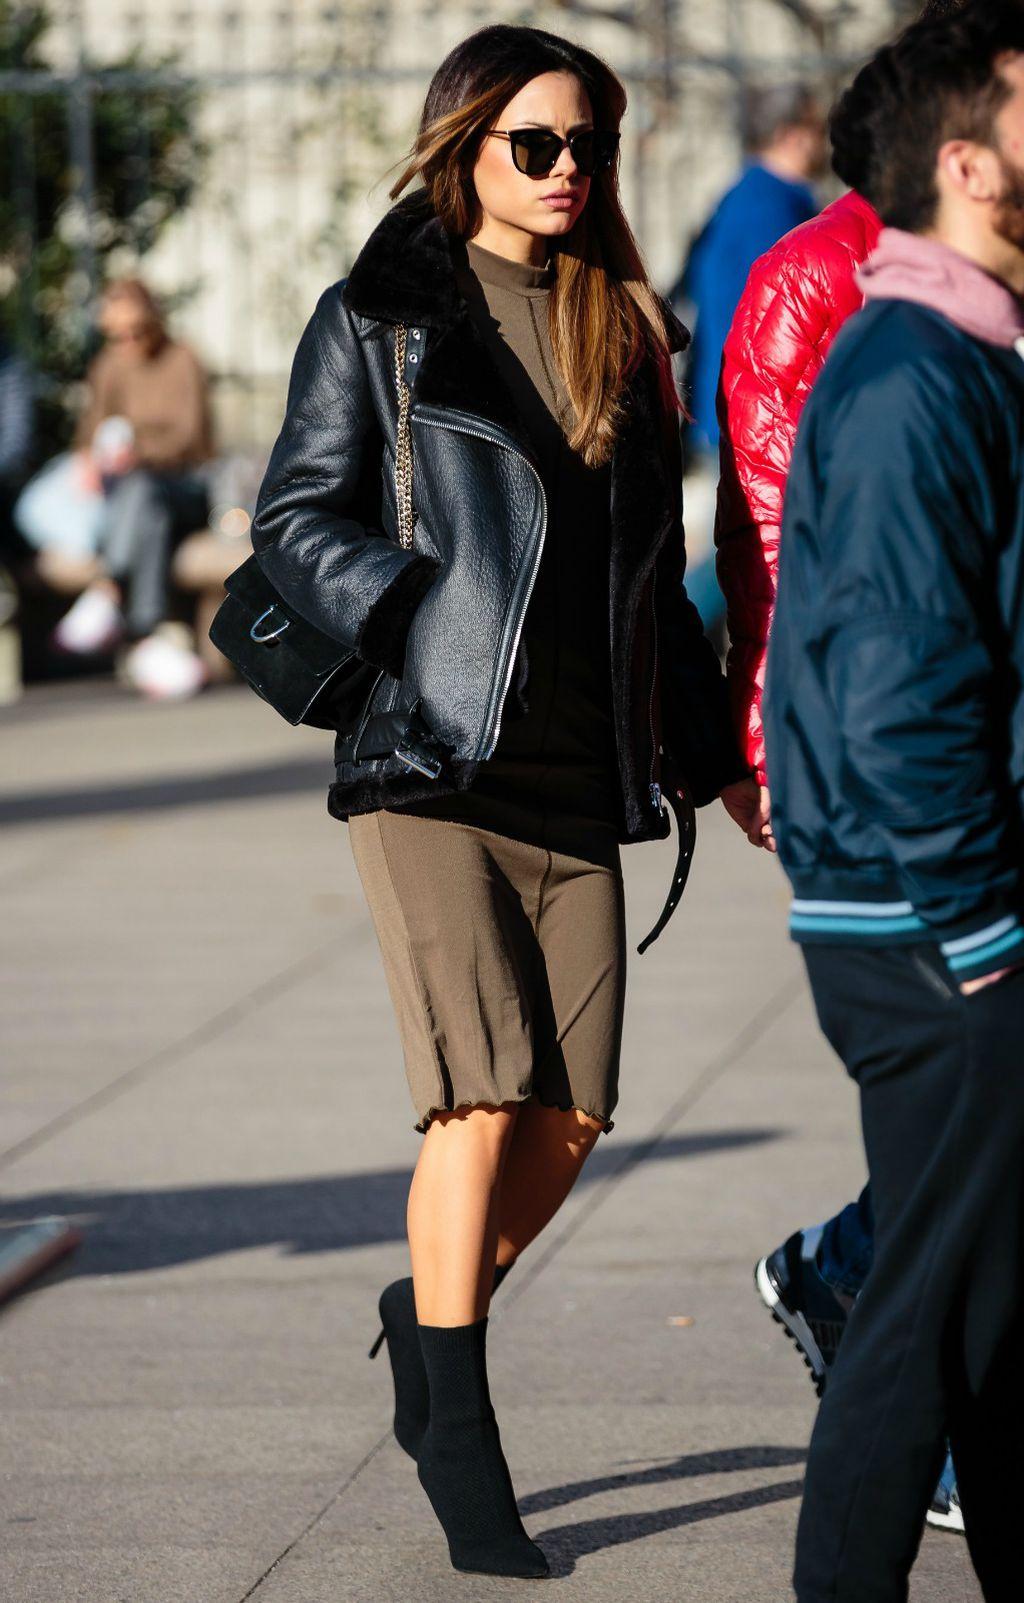 Lijepa brineta u Zarinoj jakni